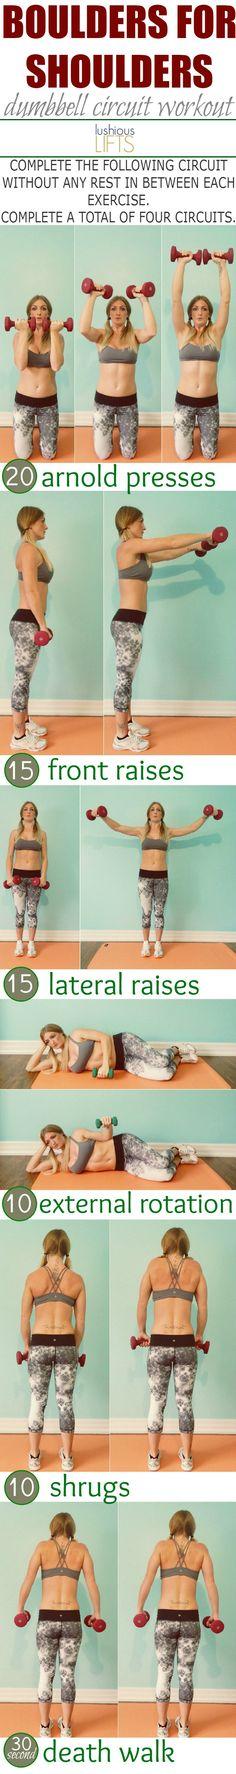 Boulders for Shoulders! Dumbbell Circuit Workout